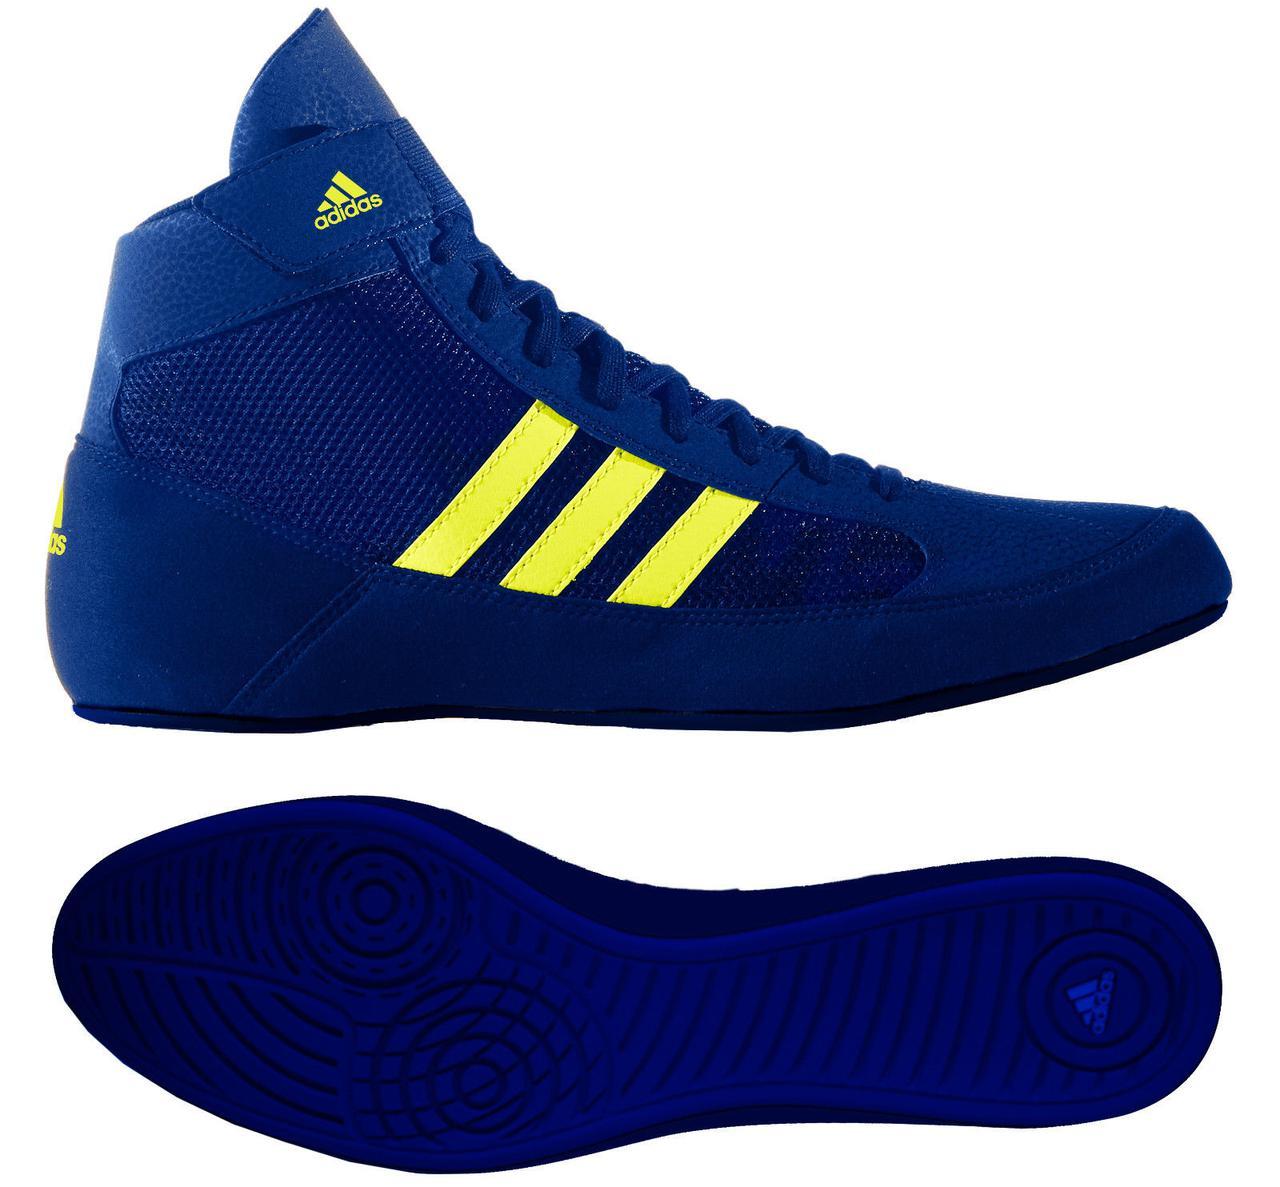 76b33e4354e6de Борцовки Adidas Havoc Kids (BD7637) Blue детские - Интернет-магазин  SportsTrend в Киеве